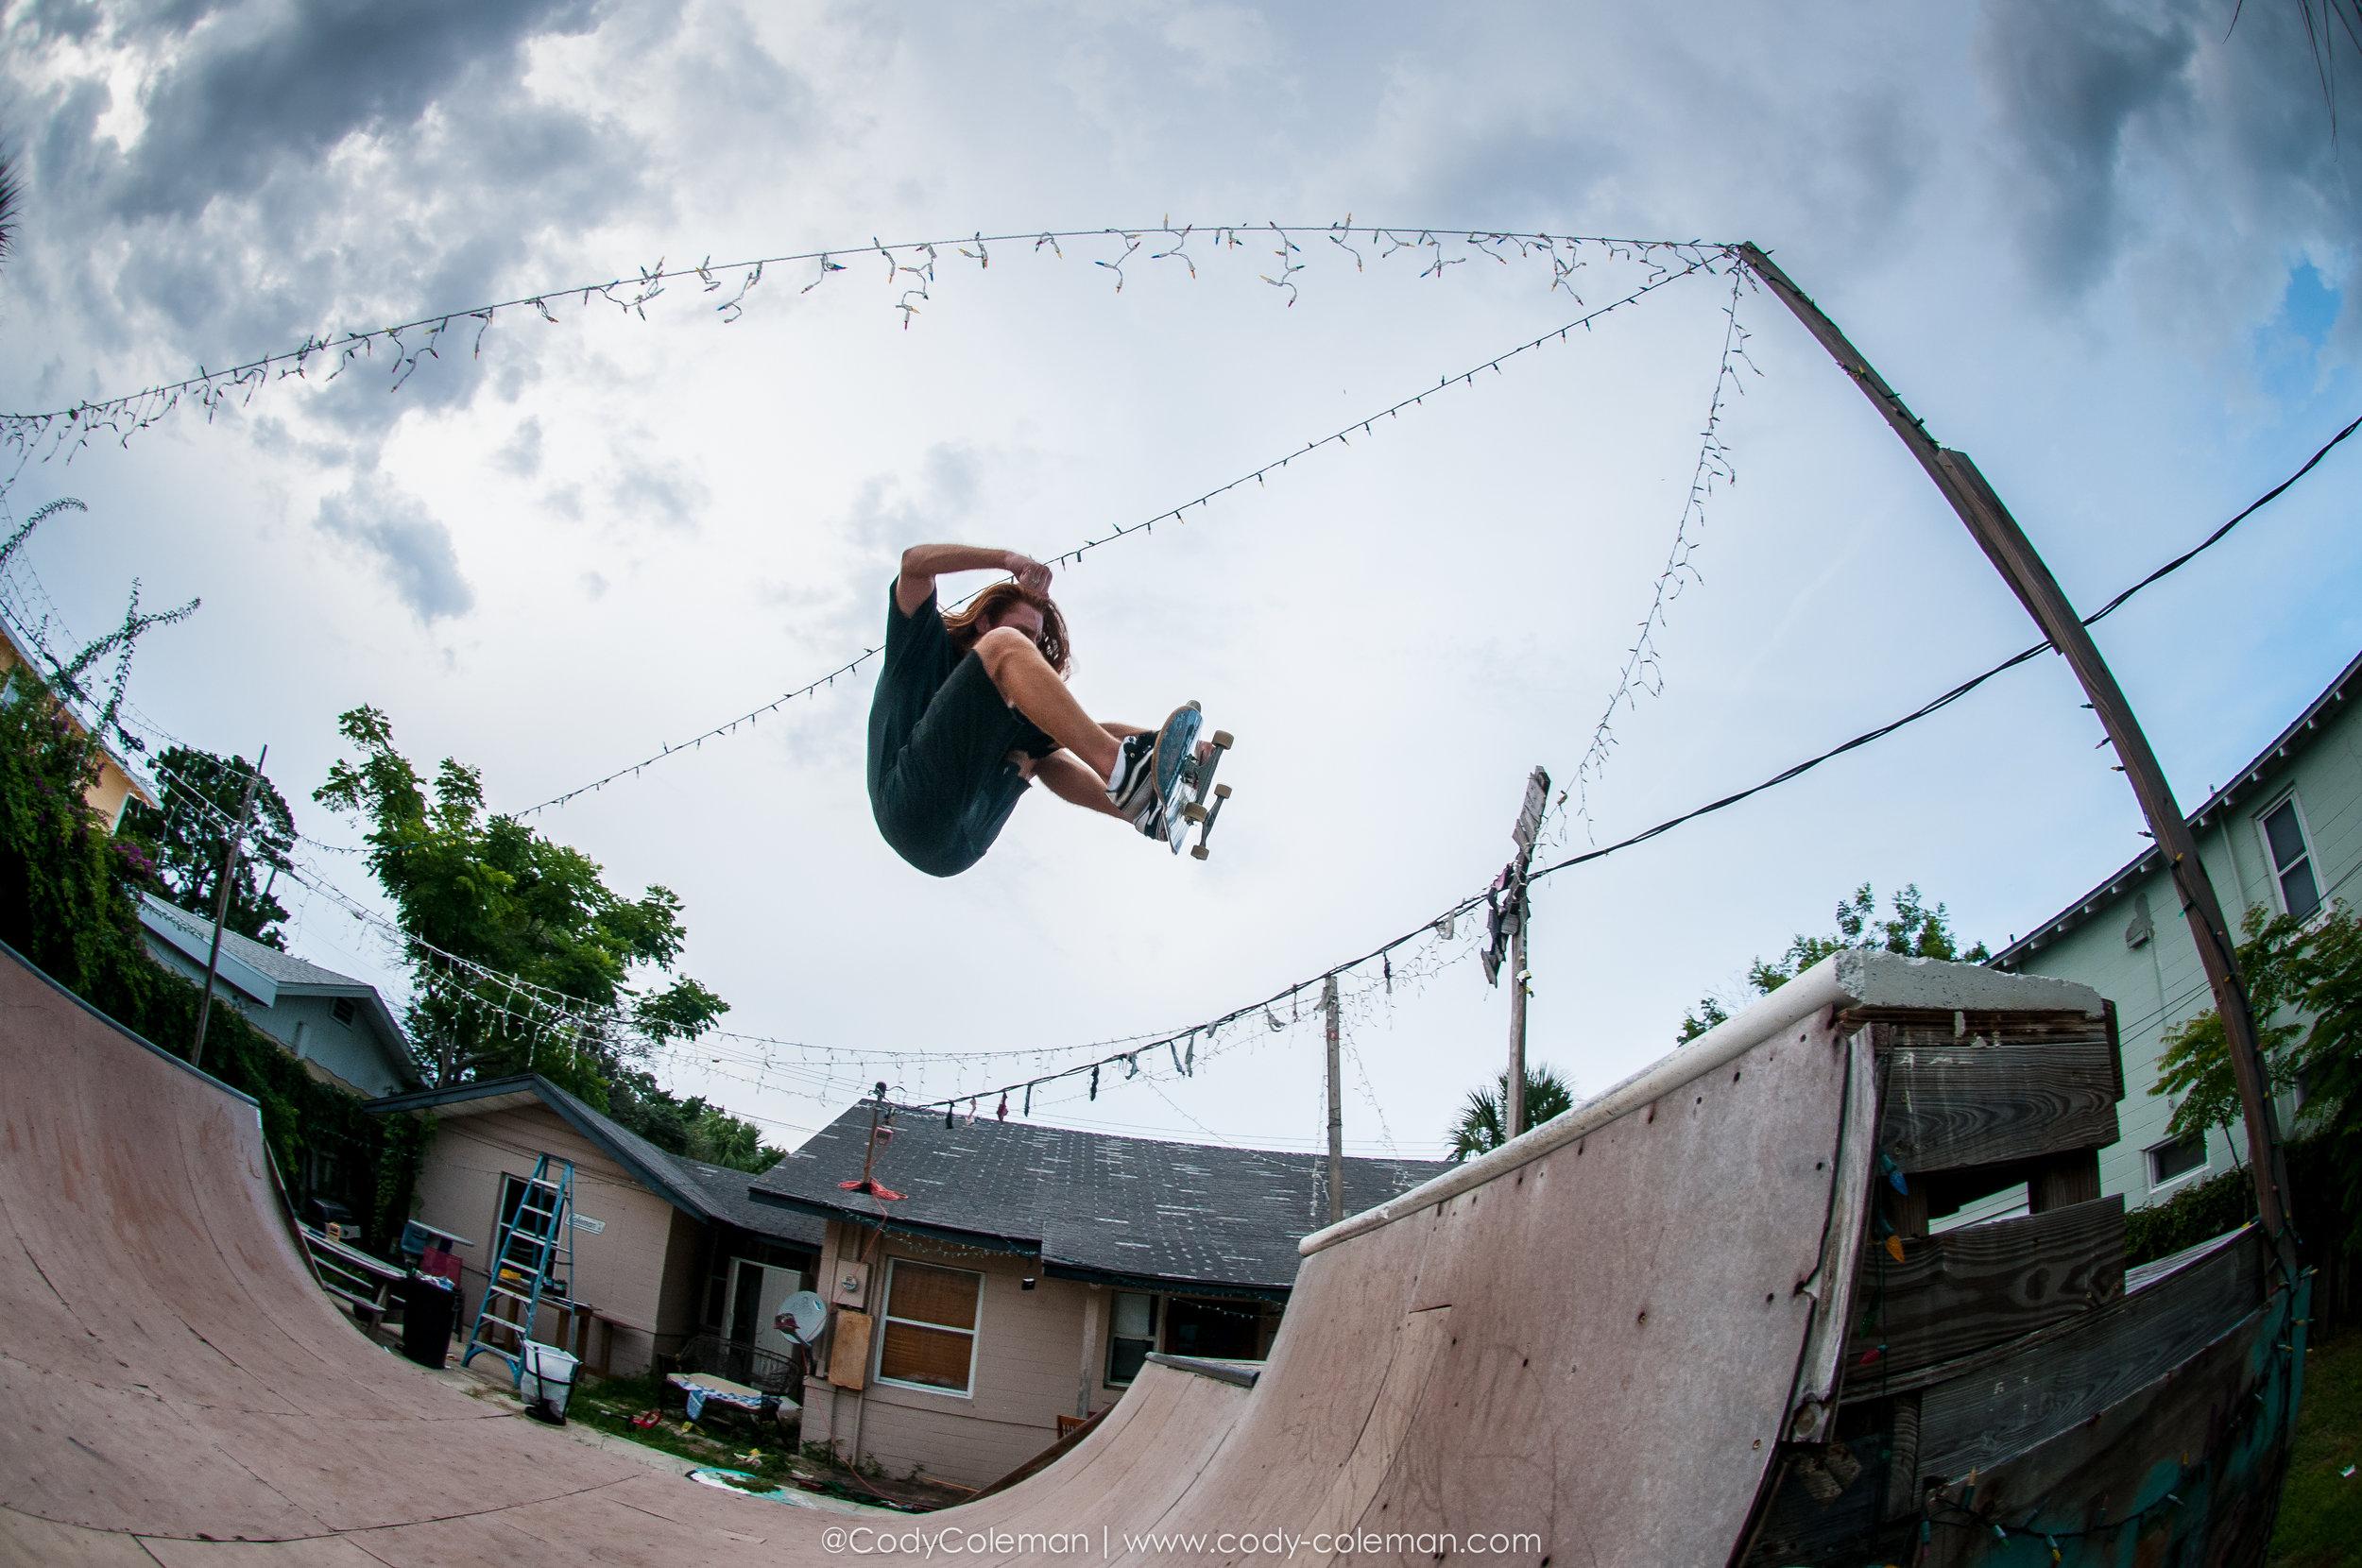 BackyardBozos_Photo_Coleman-8.jpg